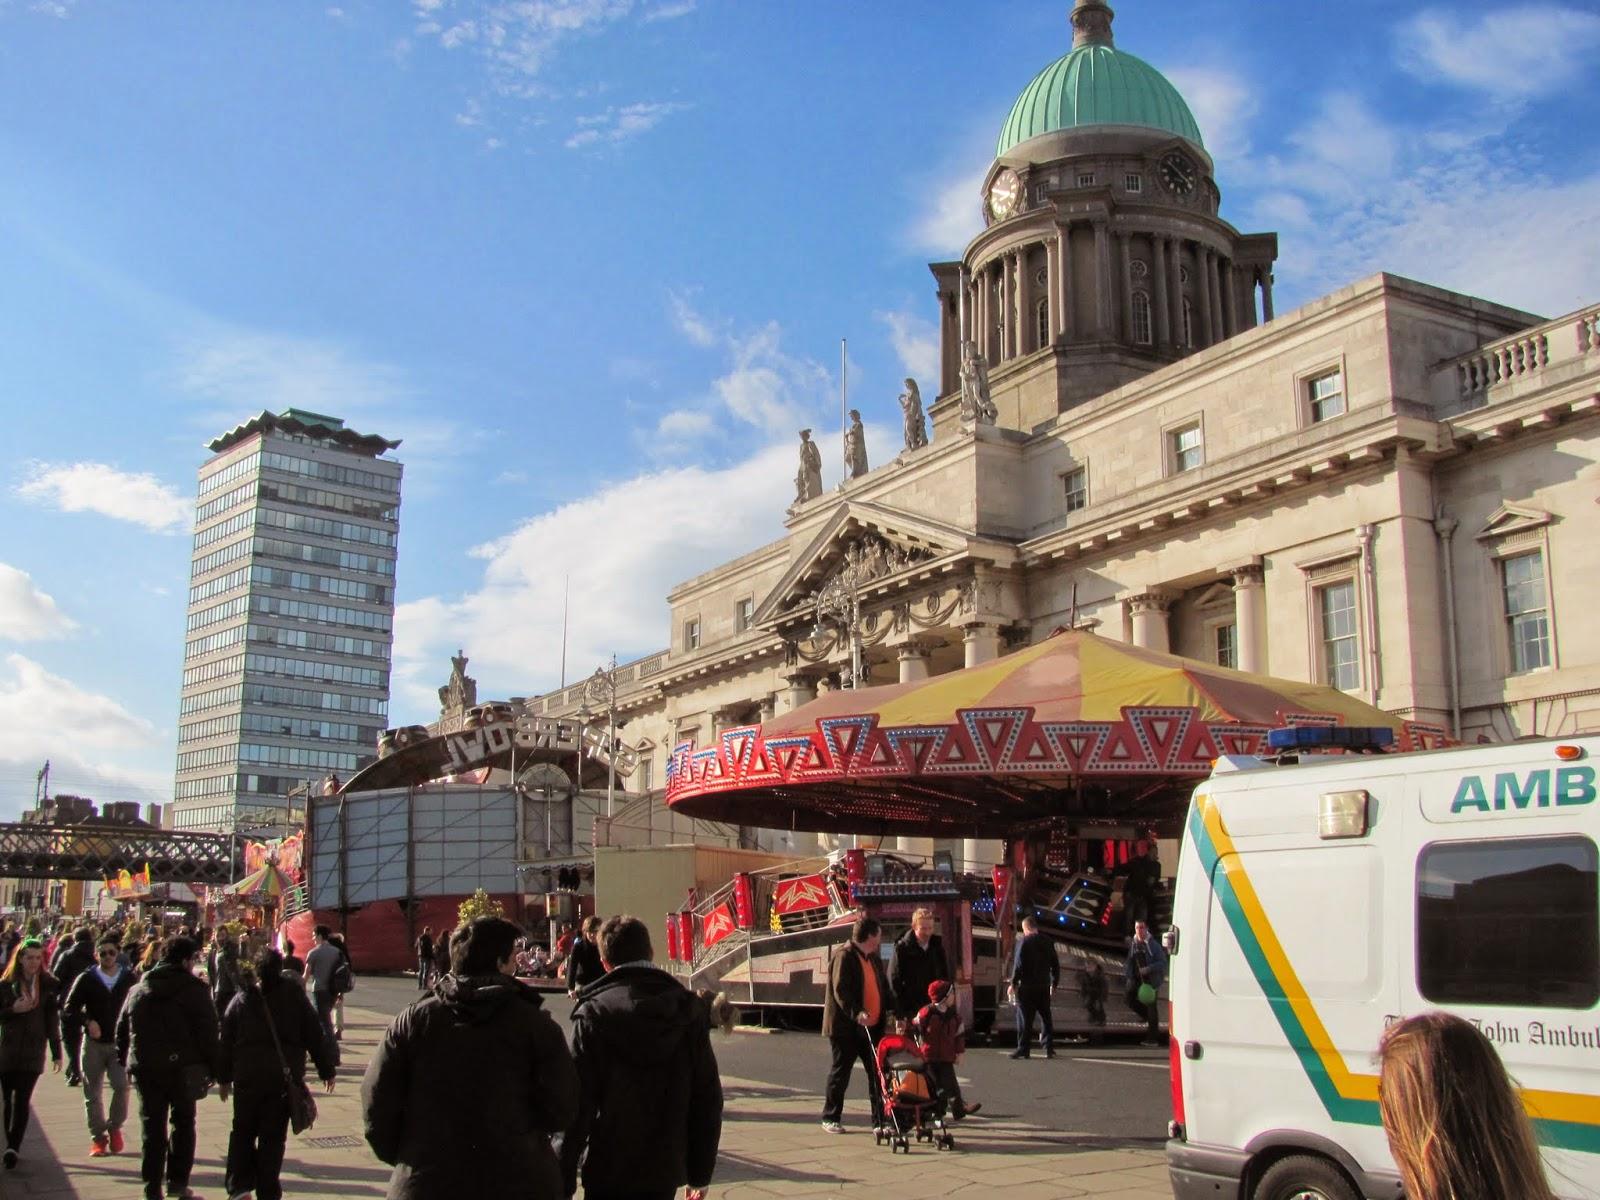 Funfair in Dublin